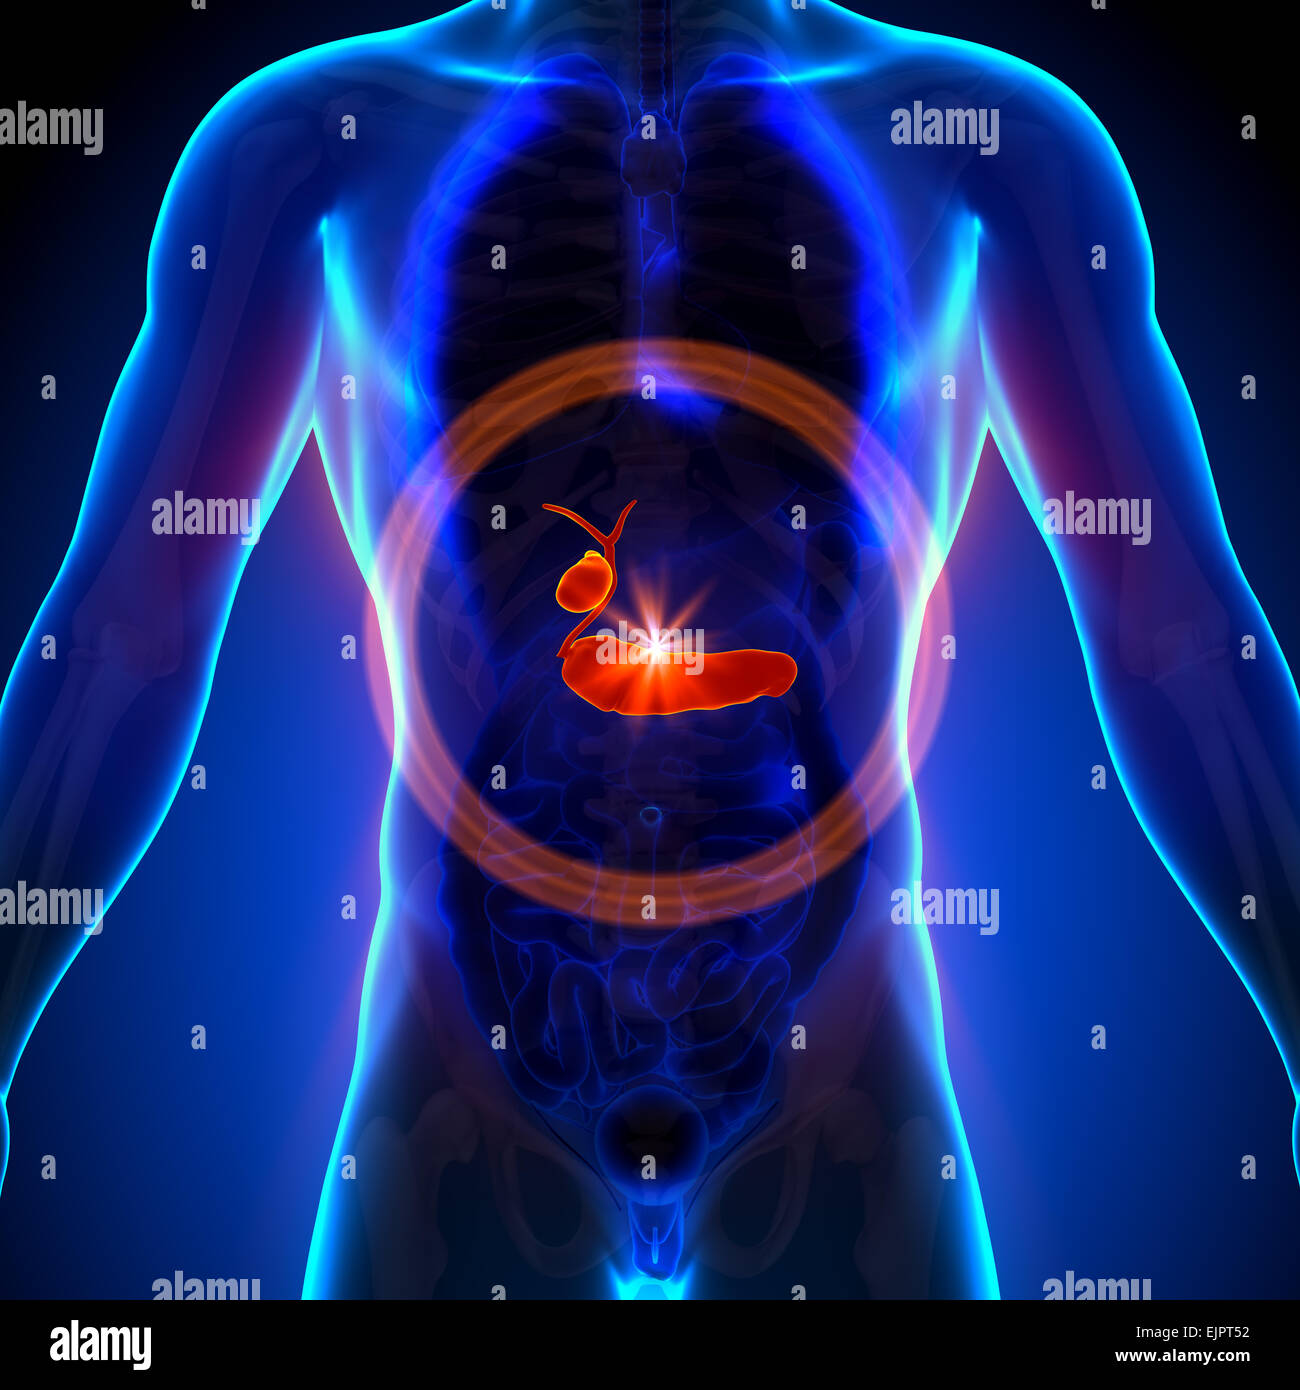 Vesícula biliar / Páncreas - anatomía masculina de órganos humanos ...